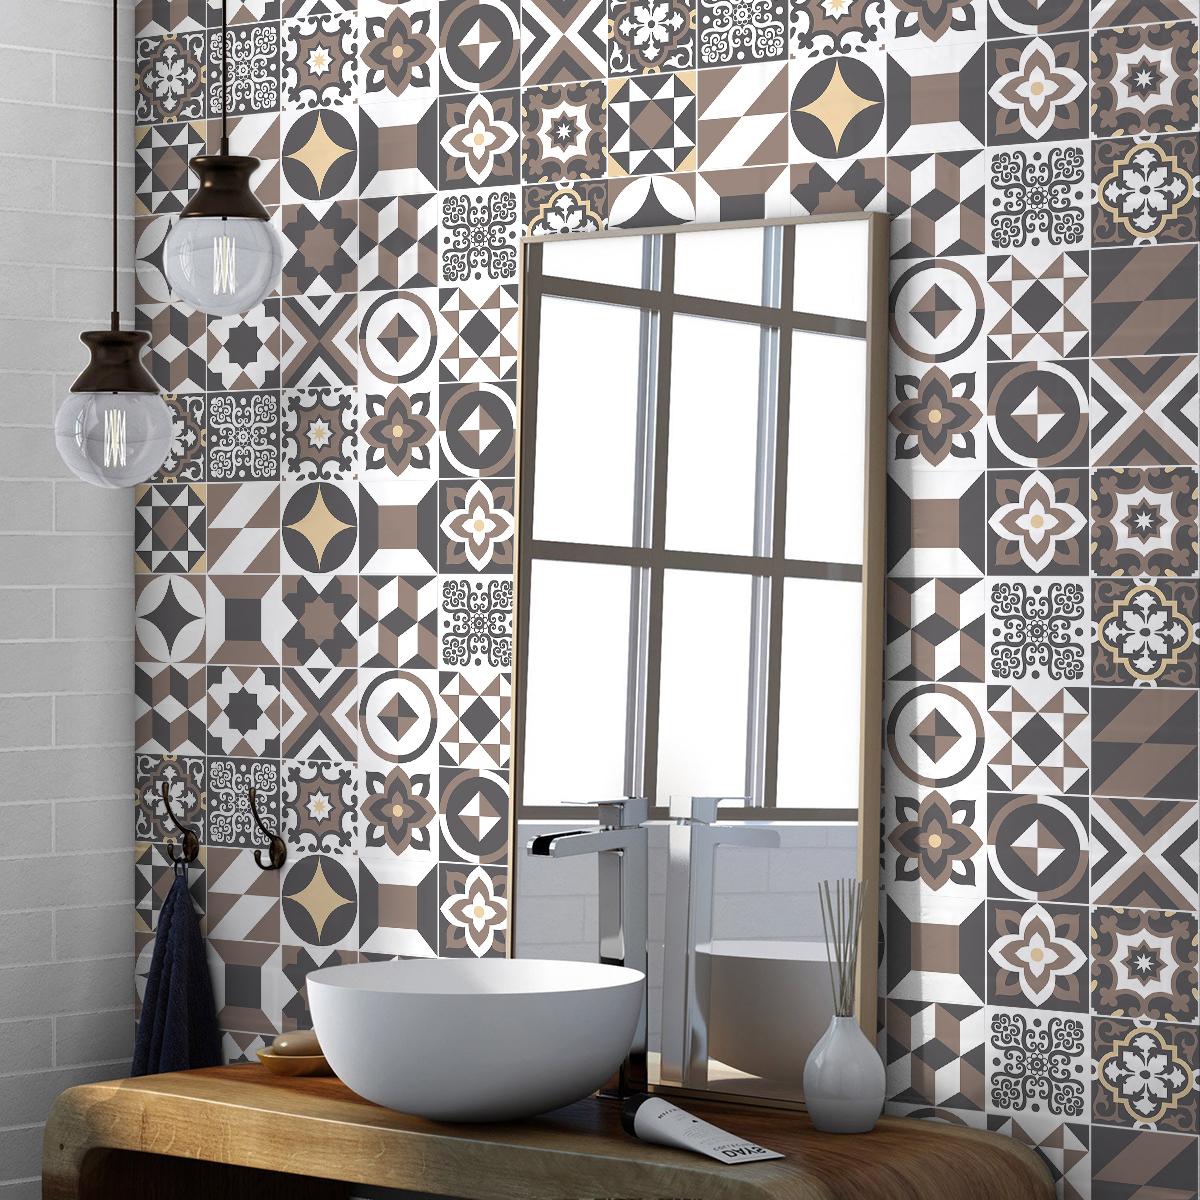 24 wandtatoos Zementfliesen azulejos solenzara